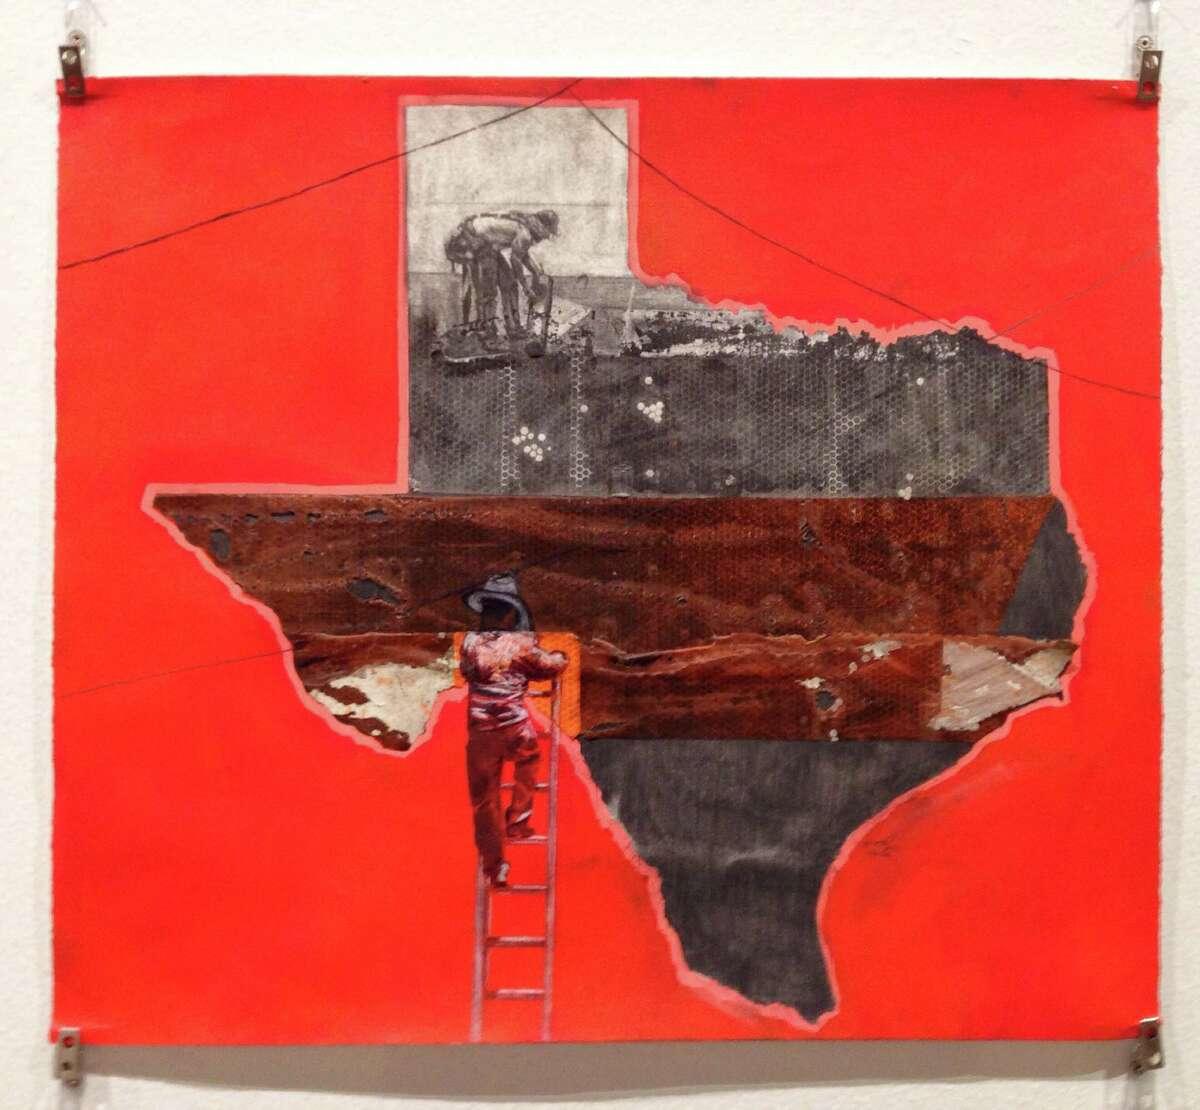 Works from artist Raul Gonzalez's